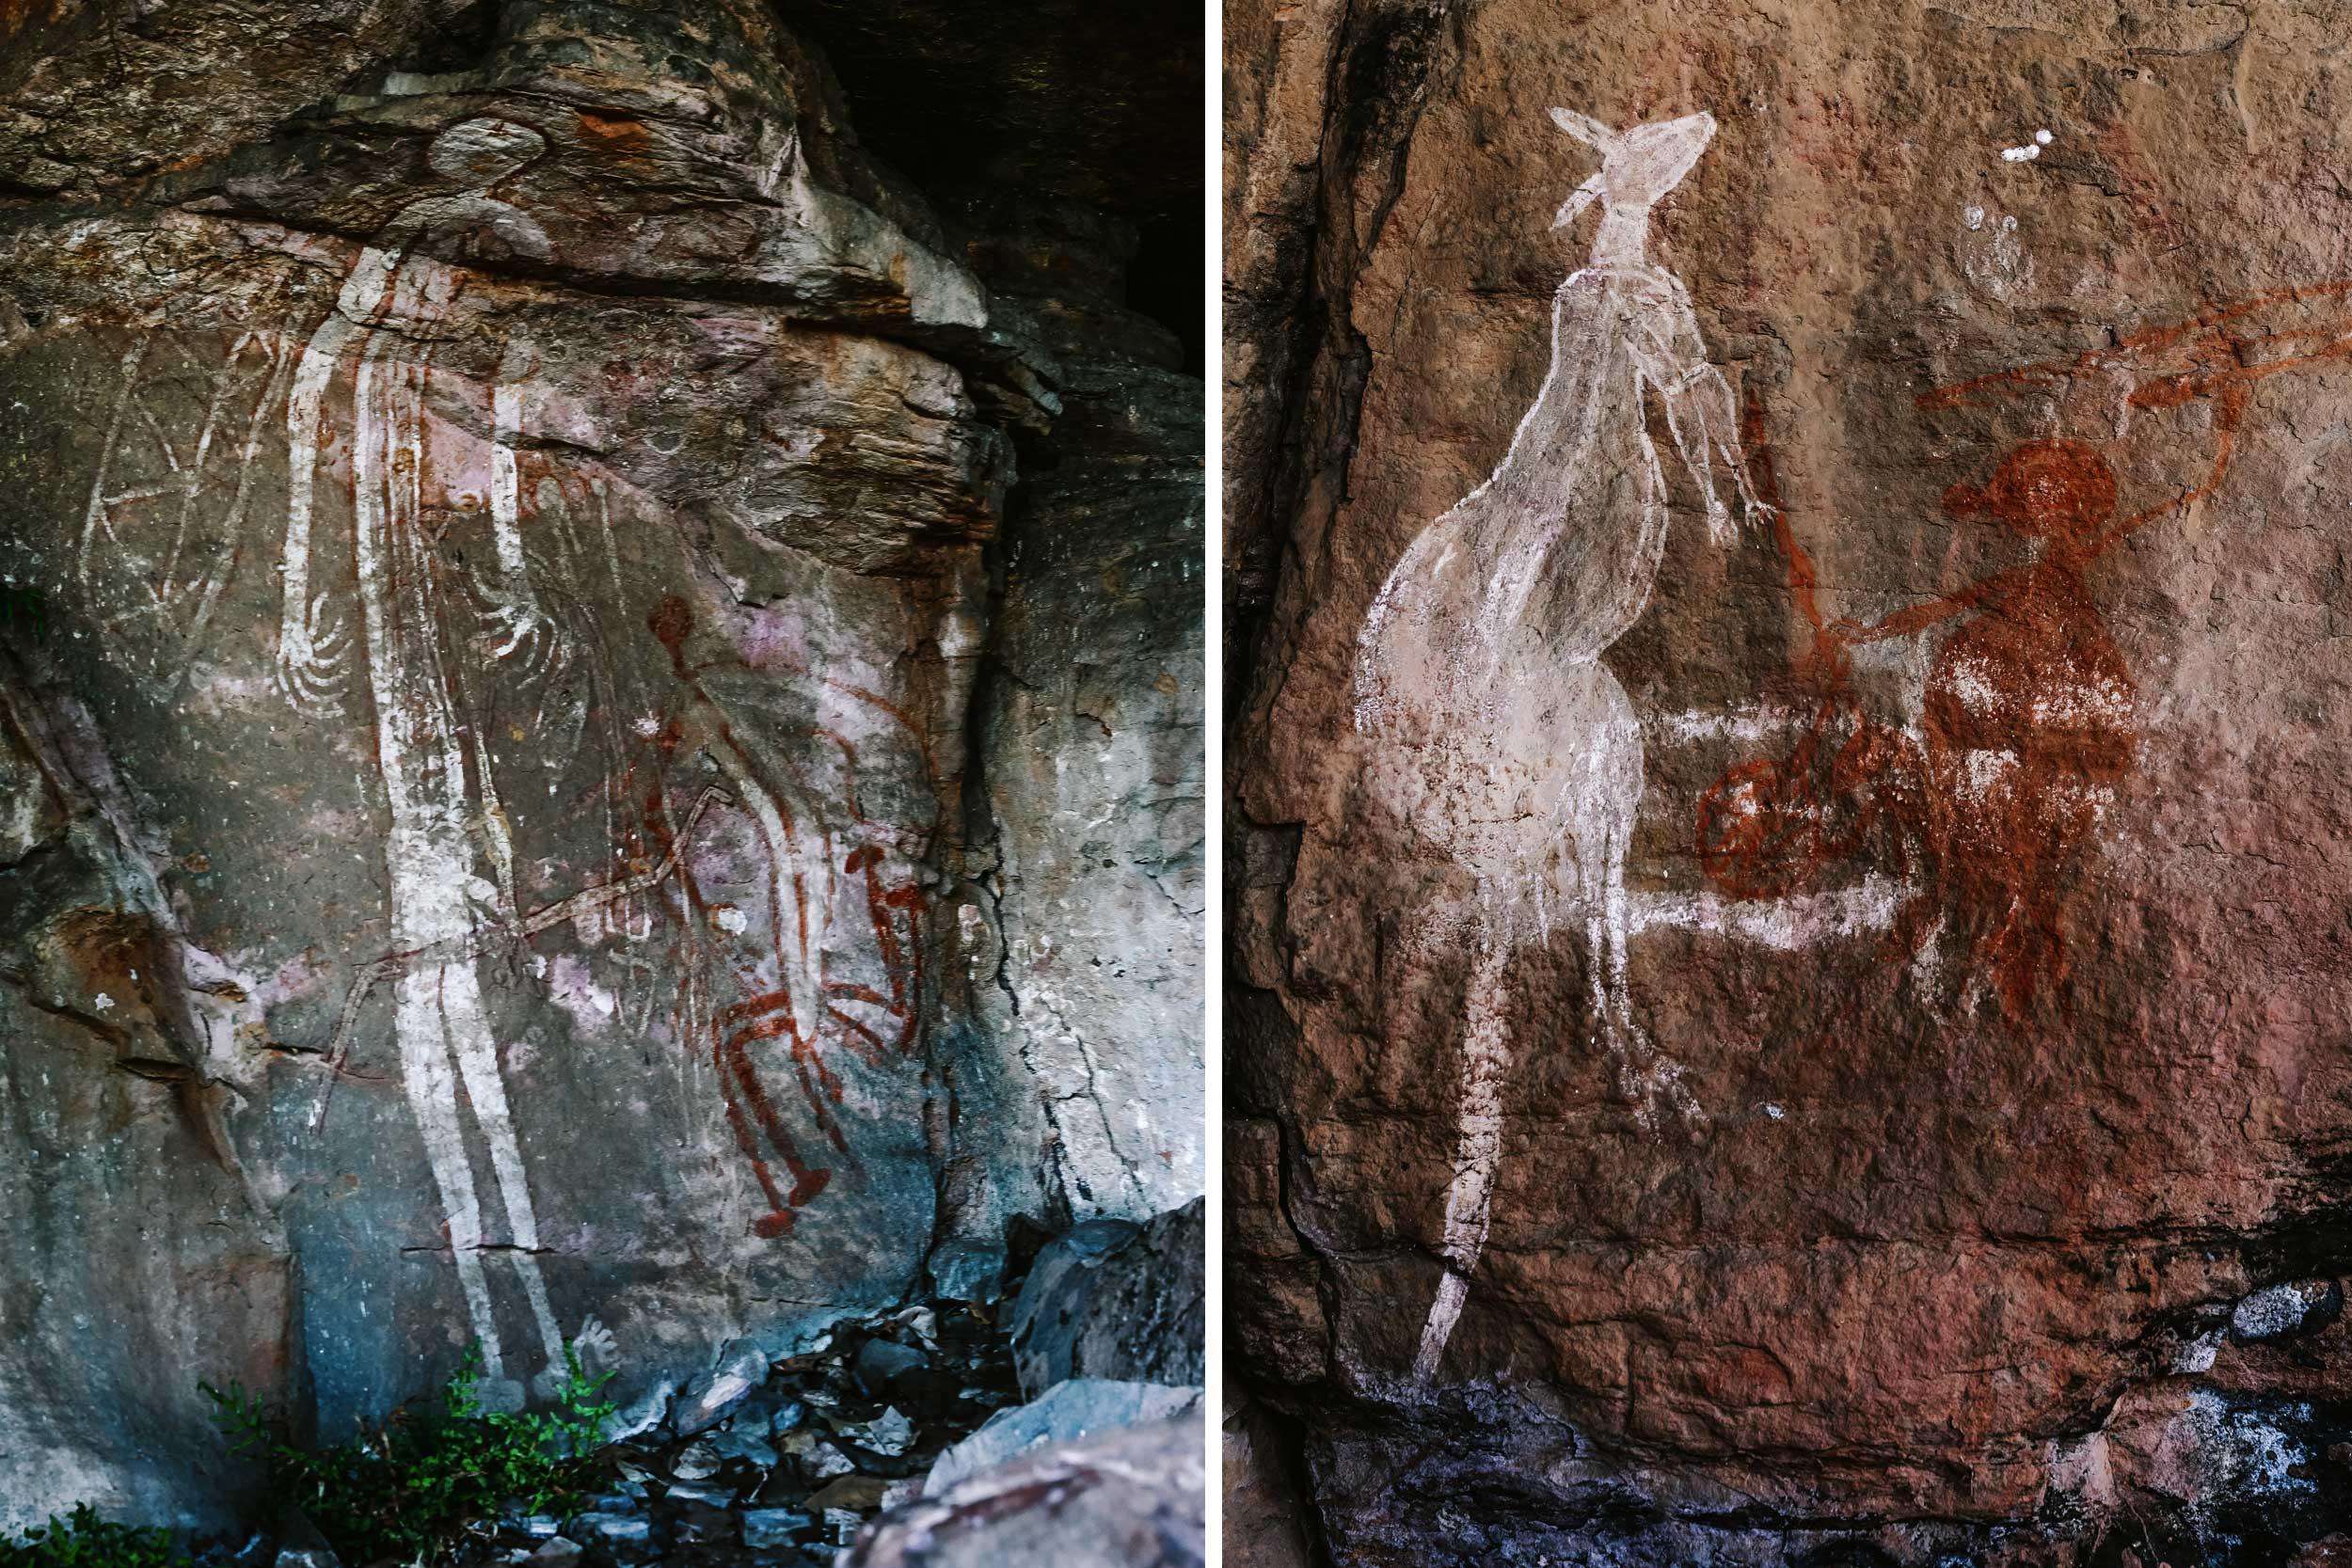 Montage of aboriginal art, Northern Territory, Australia